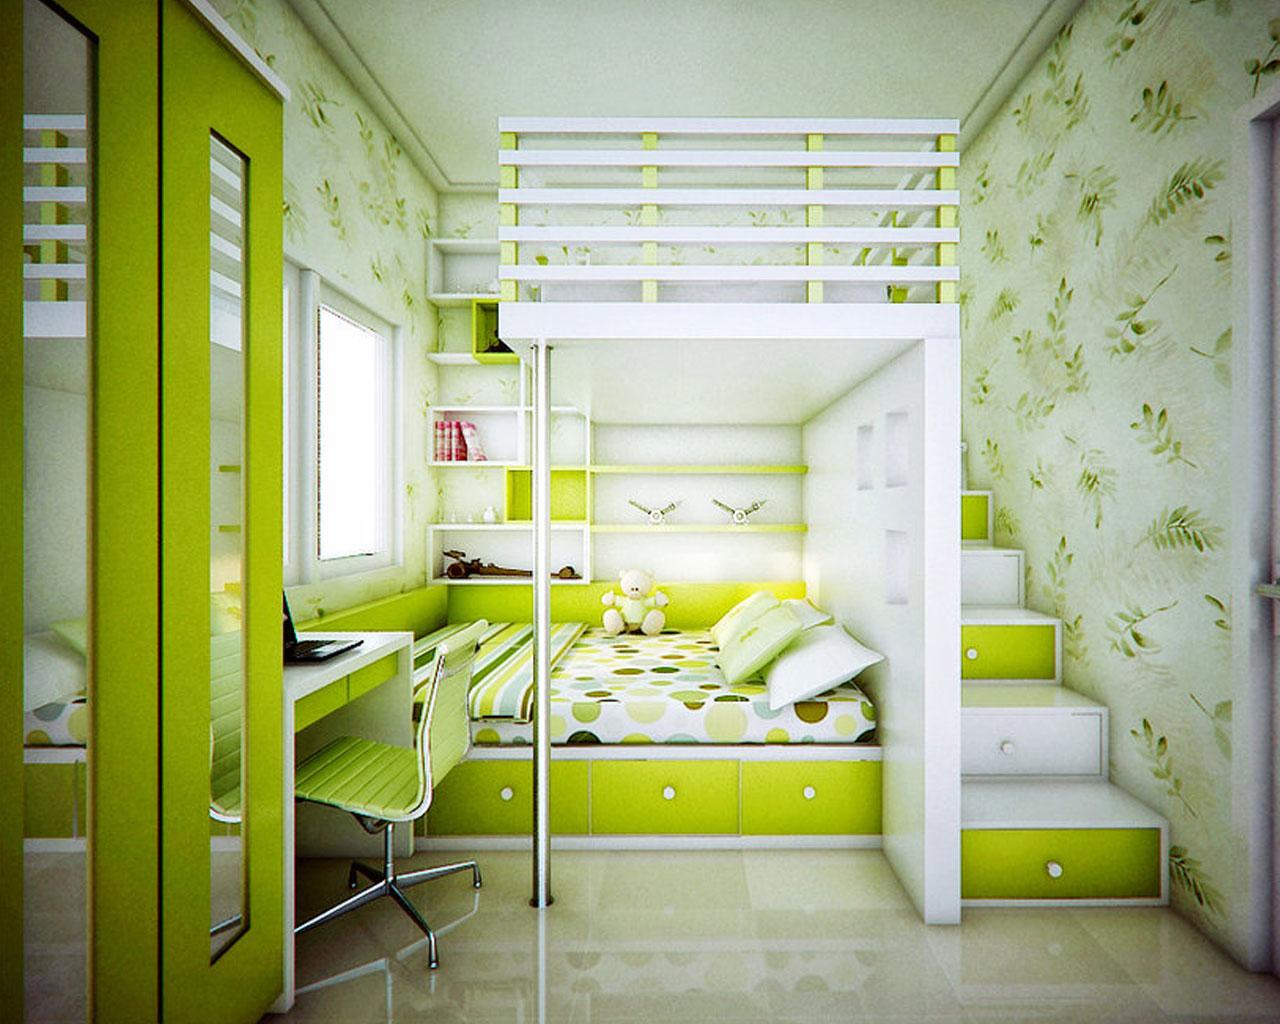 Modern Small Green Bedroom 1280x1024 Wallpaper Teahub Io